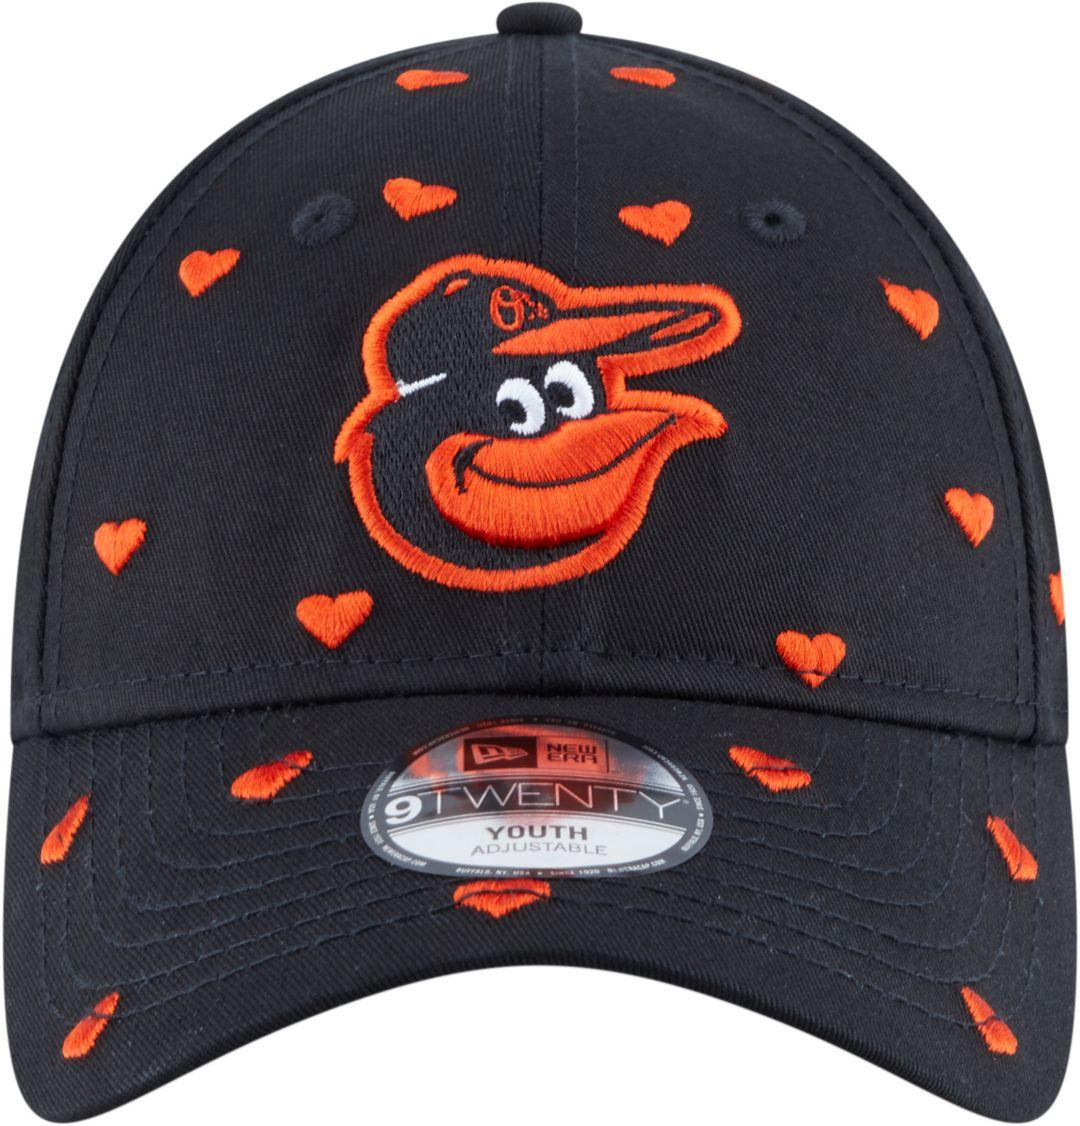 best sneakers 58147 3fd1d New Era Youth Baltimore Orioles 9Twenty Lovely Fan Adjustable Hat.  noImageFound. Previous. 1. 2. 3